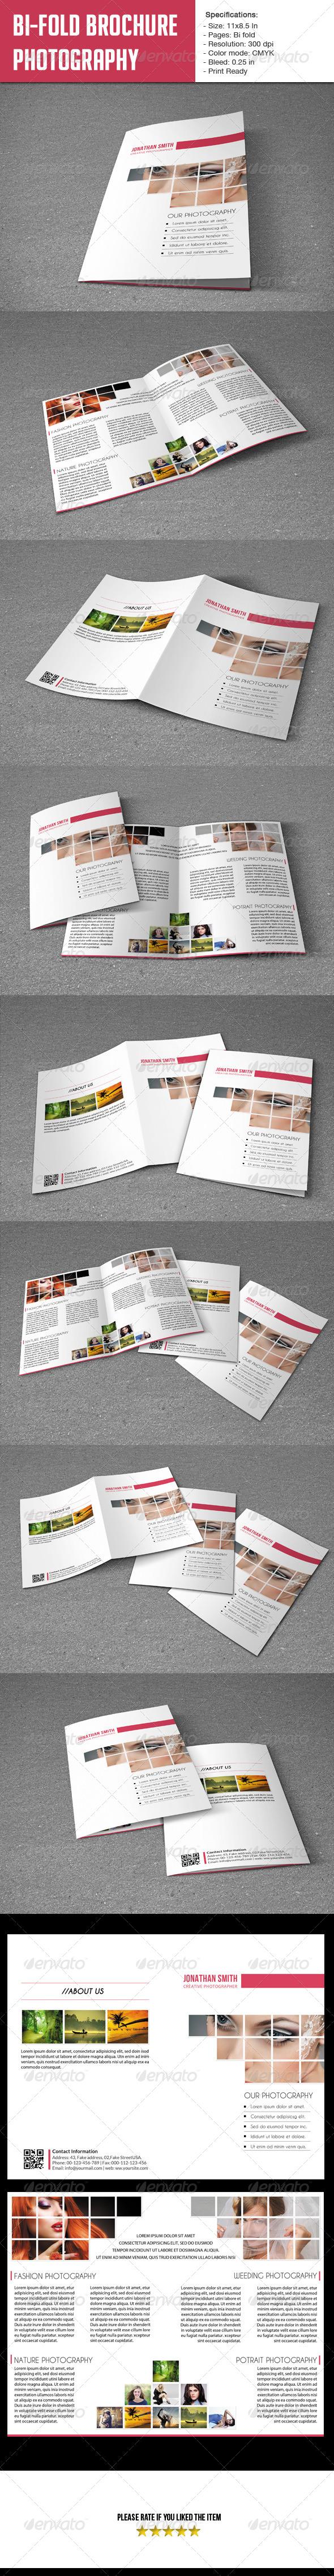 Bifold Brochure-Photographer - Portfolio Brochures